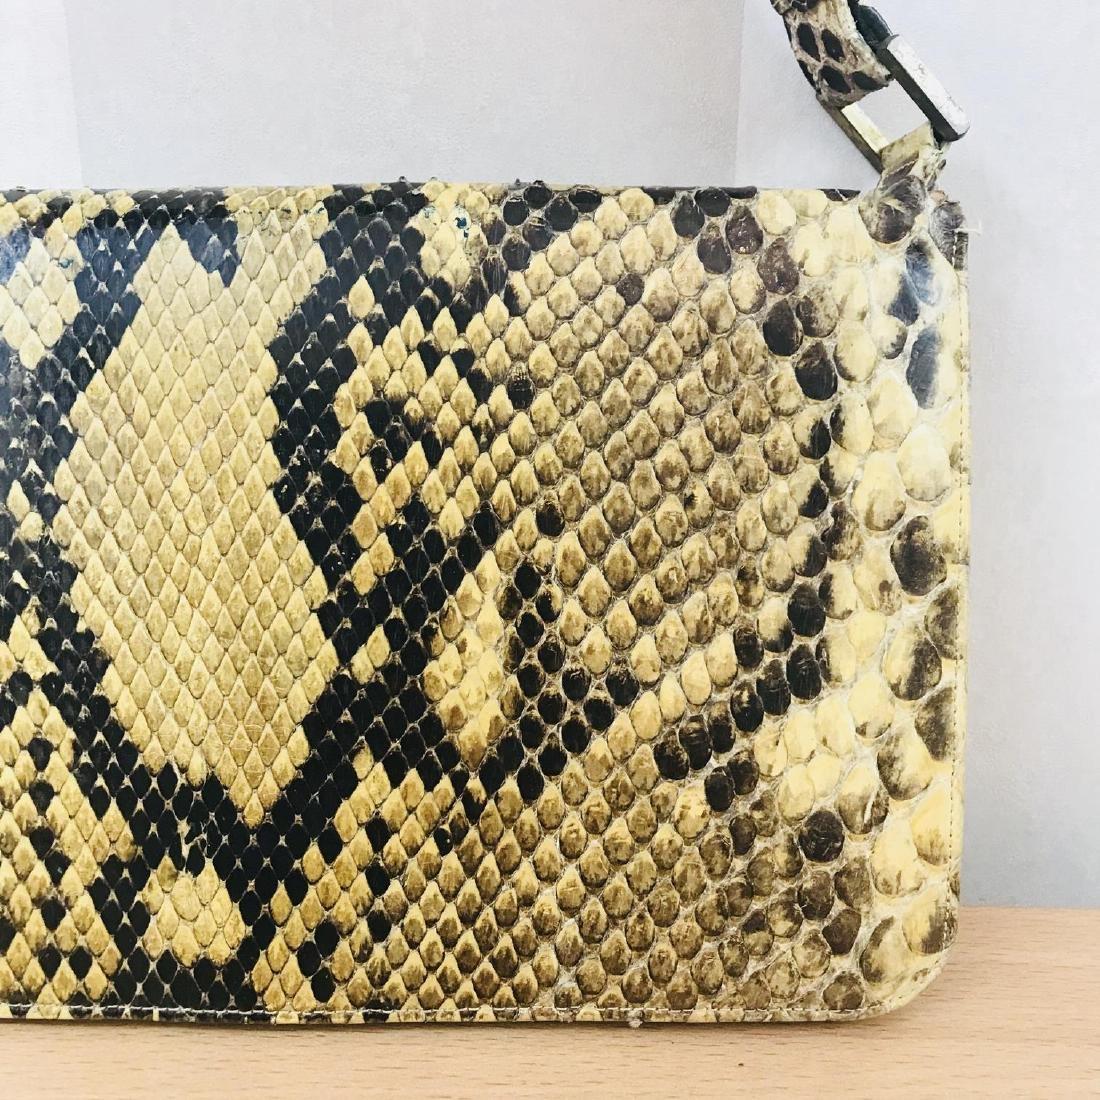 Vintage Snakeskin Leather Handbag - 2